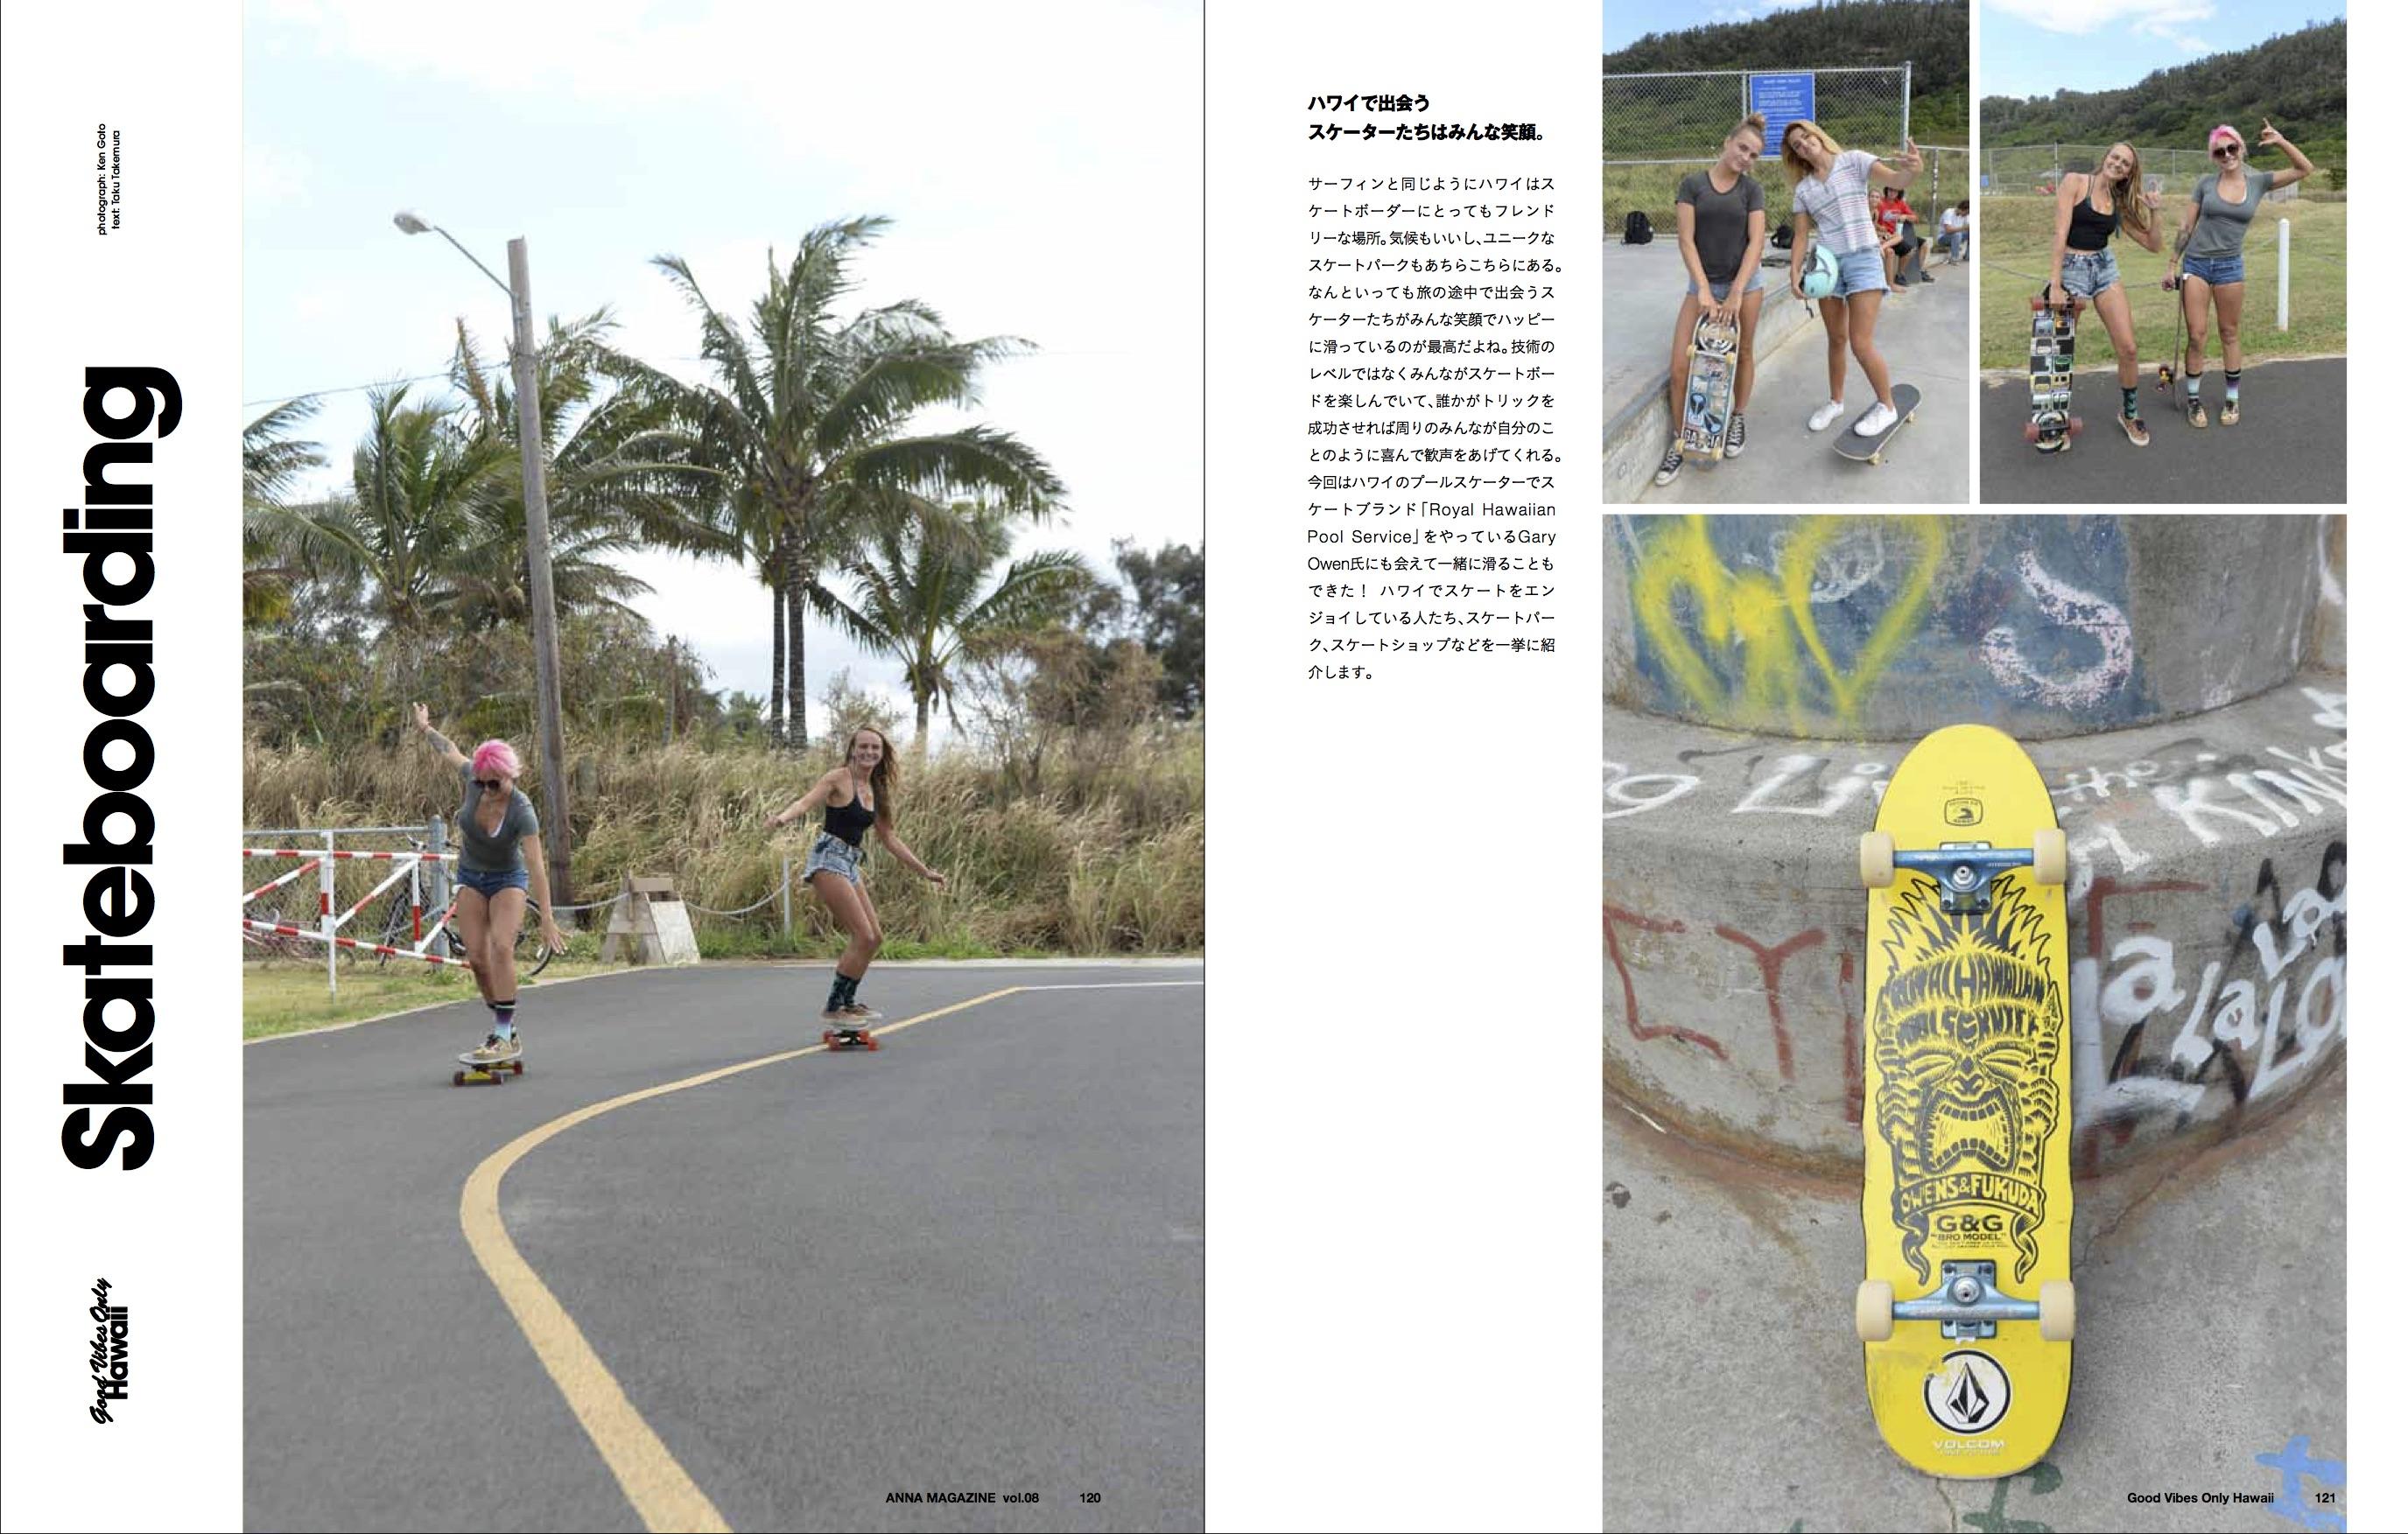 anna magazine vol.8 P58